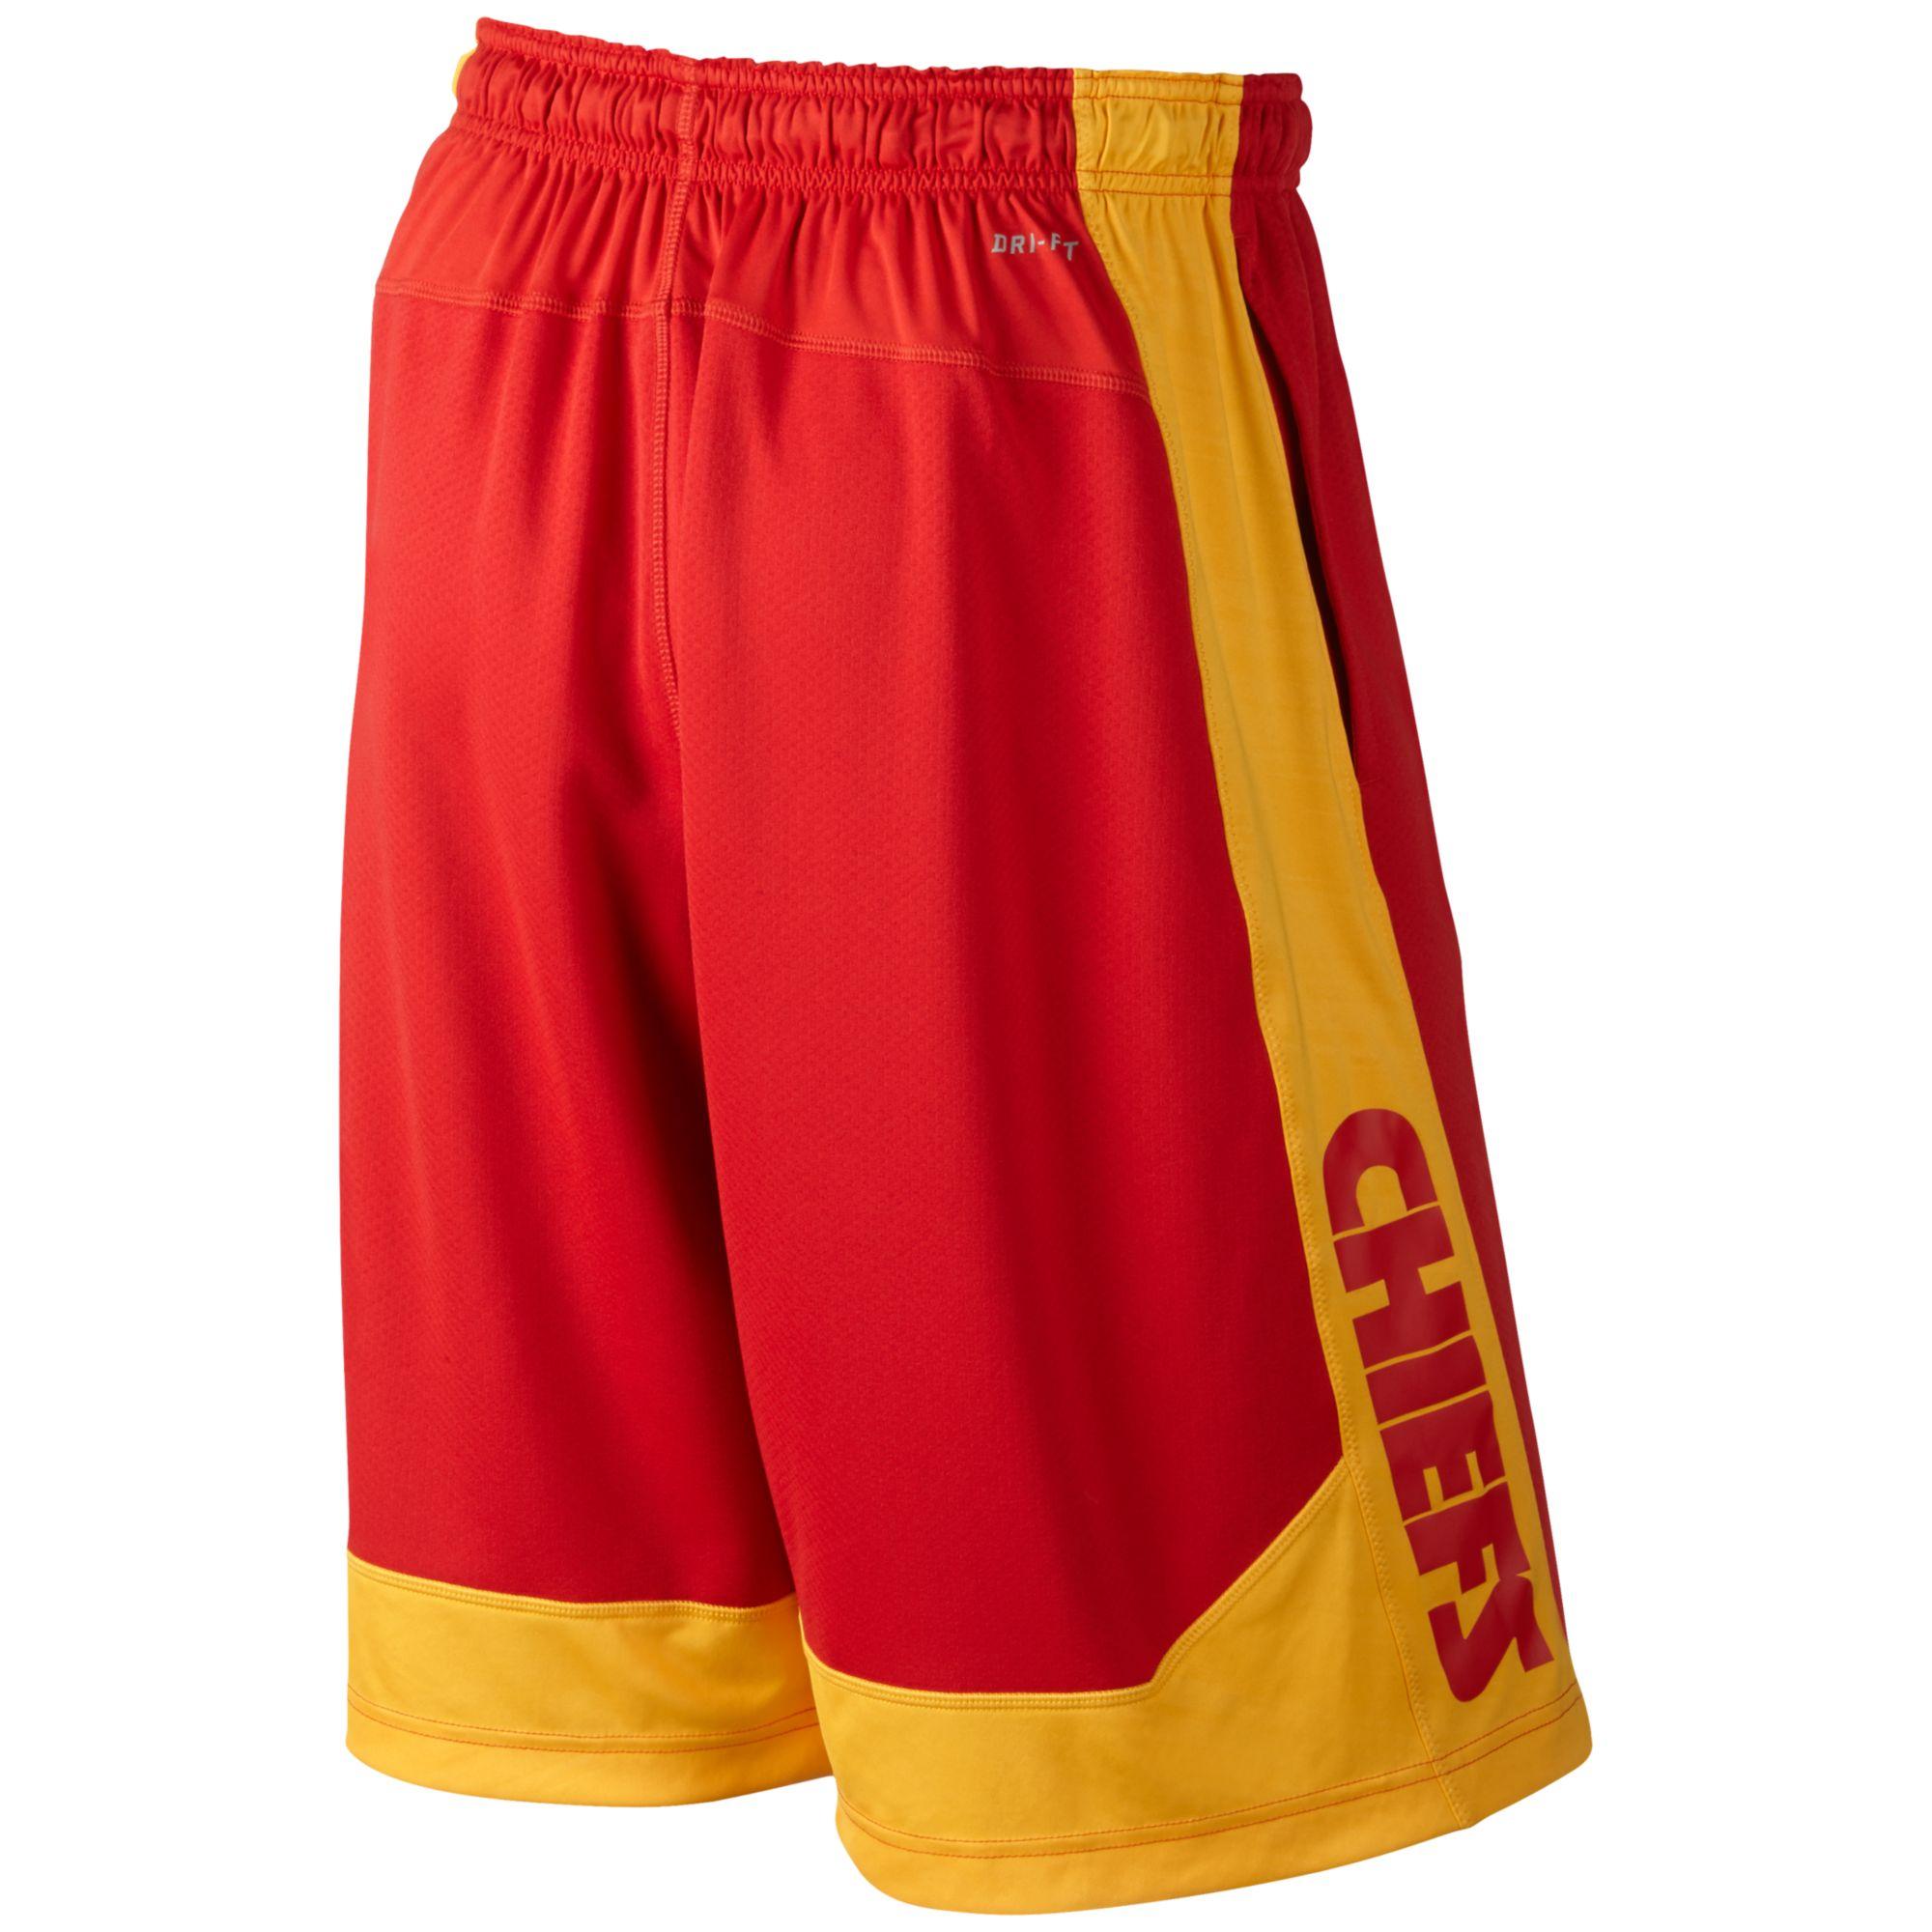 db29f78301d Lyst - Nike Mens Kansas City Chiefs Fly Xl Drifit Shorts in Red for Men